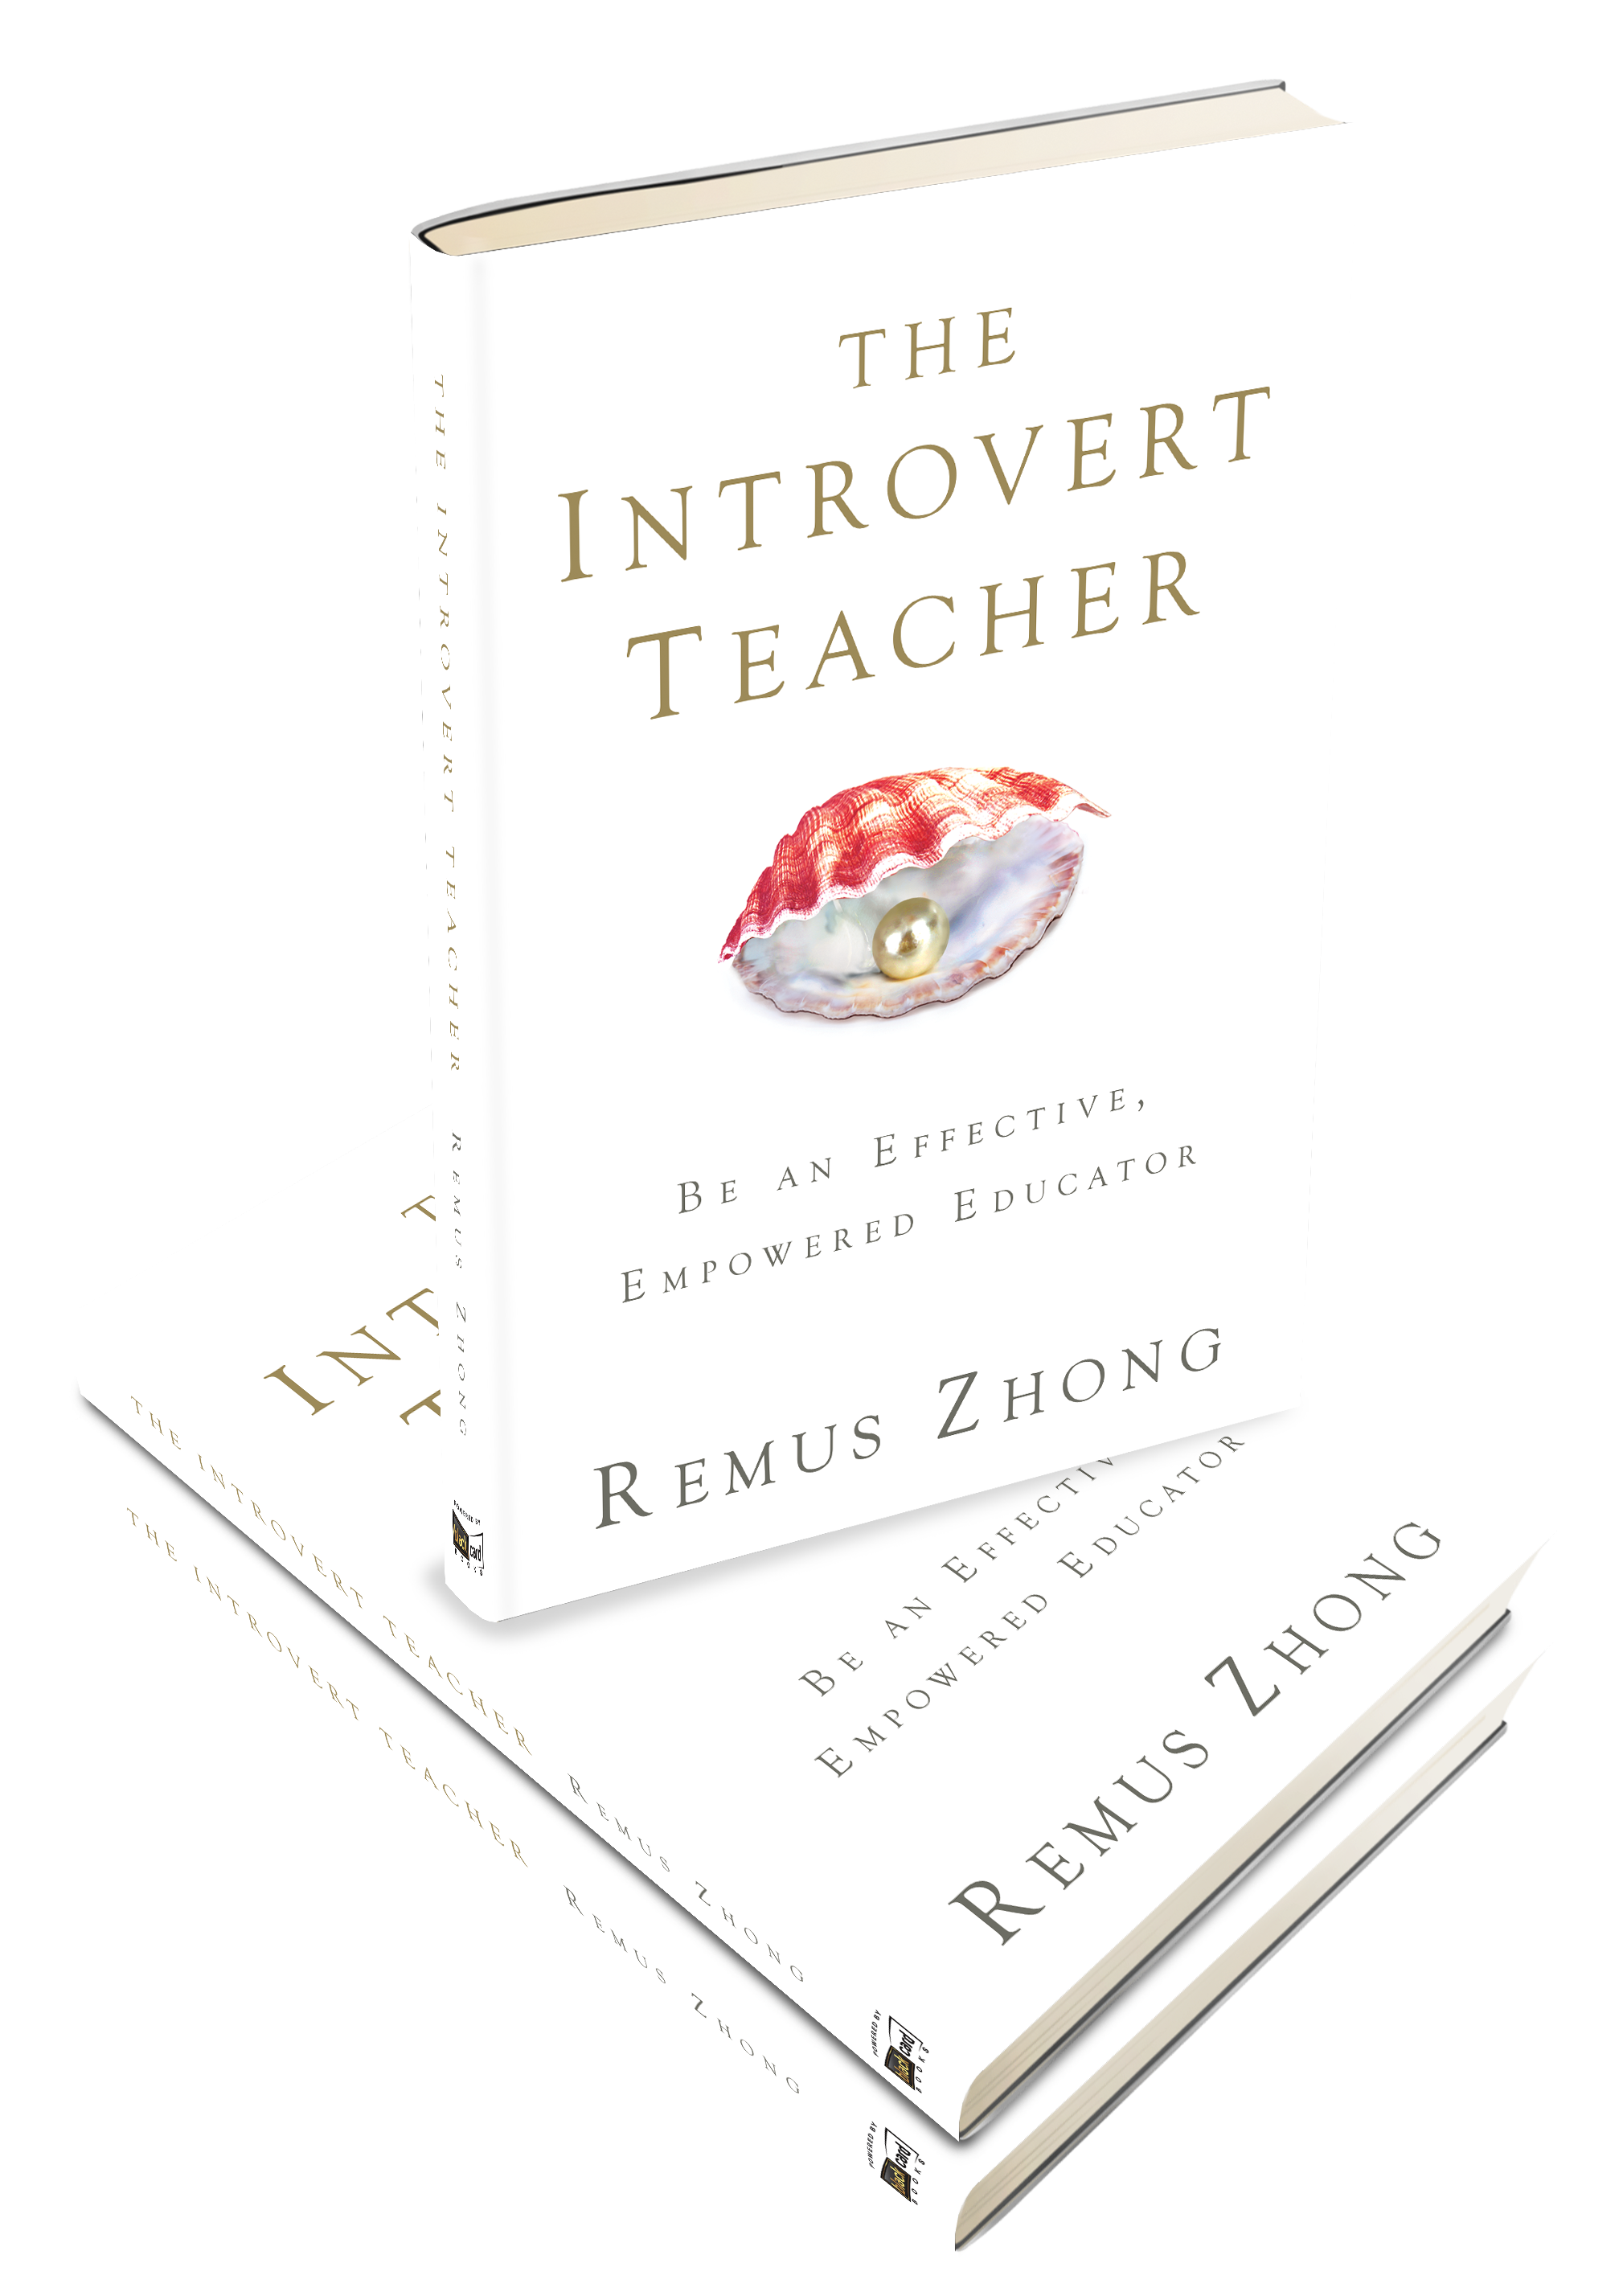 The Introvert Teacher - Stack